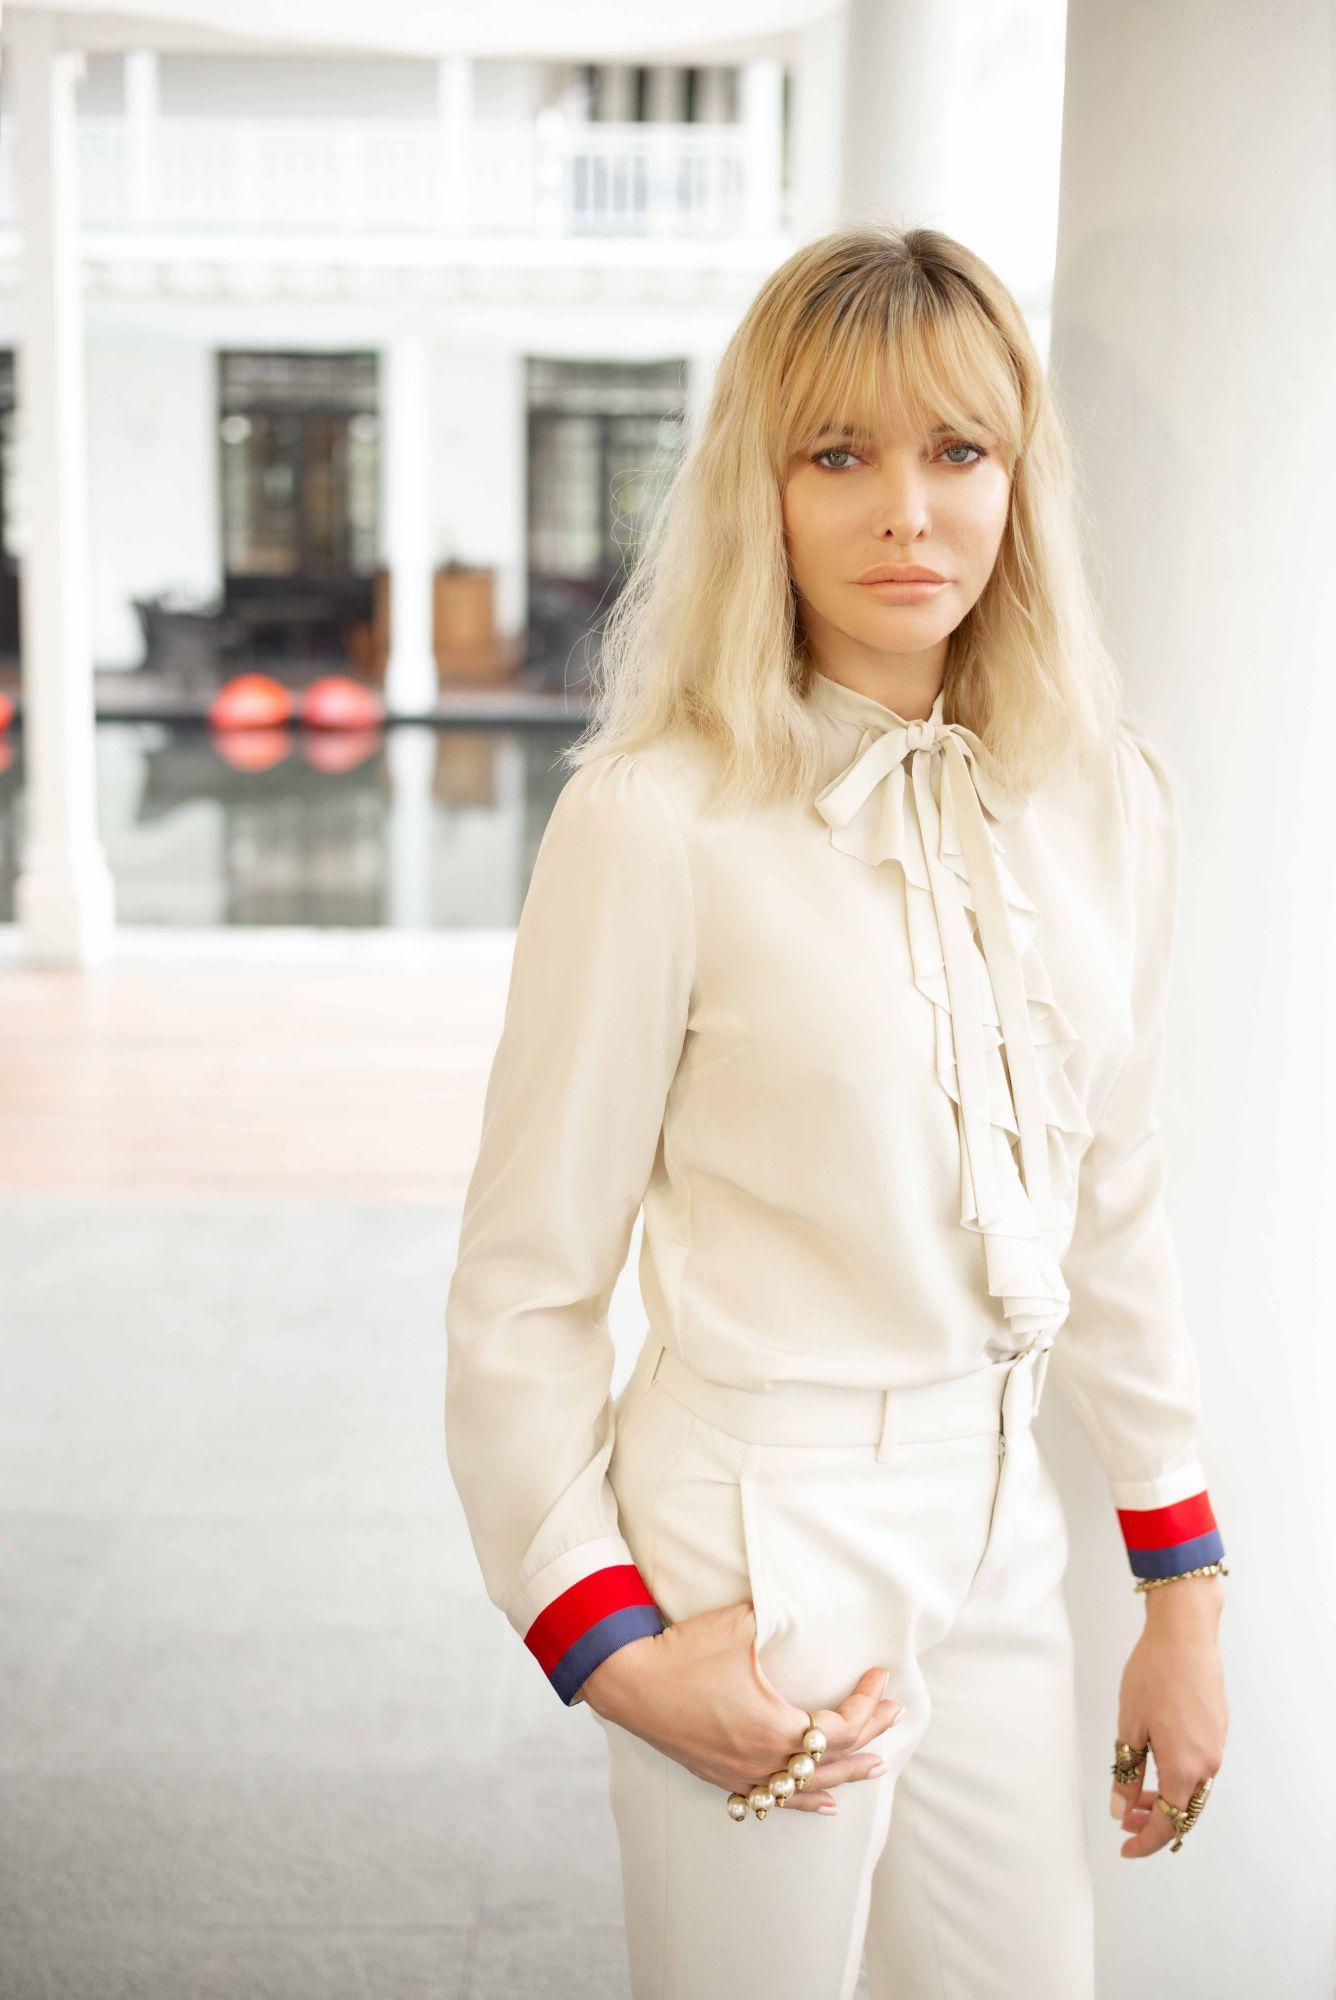 5 Minutes With… Natalya Pavchinskaya, Founder And CEO Of The Sanchaya